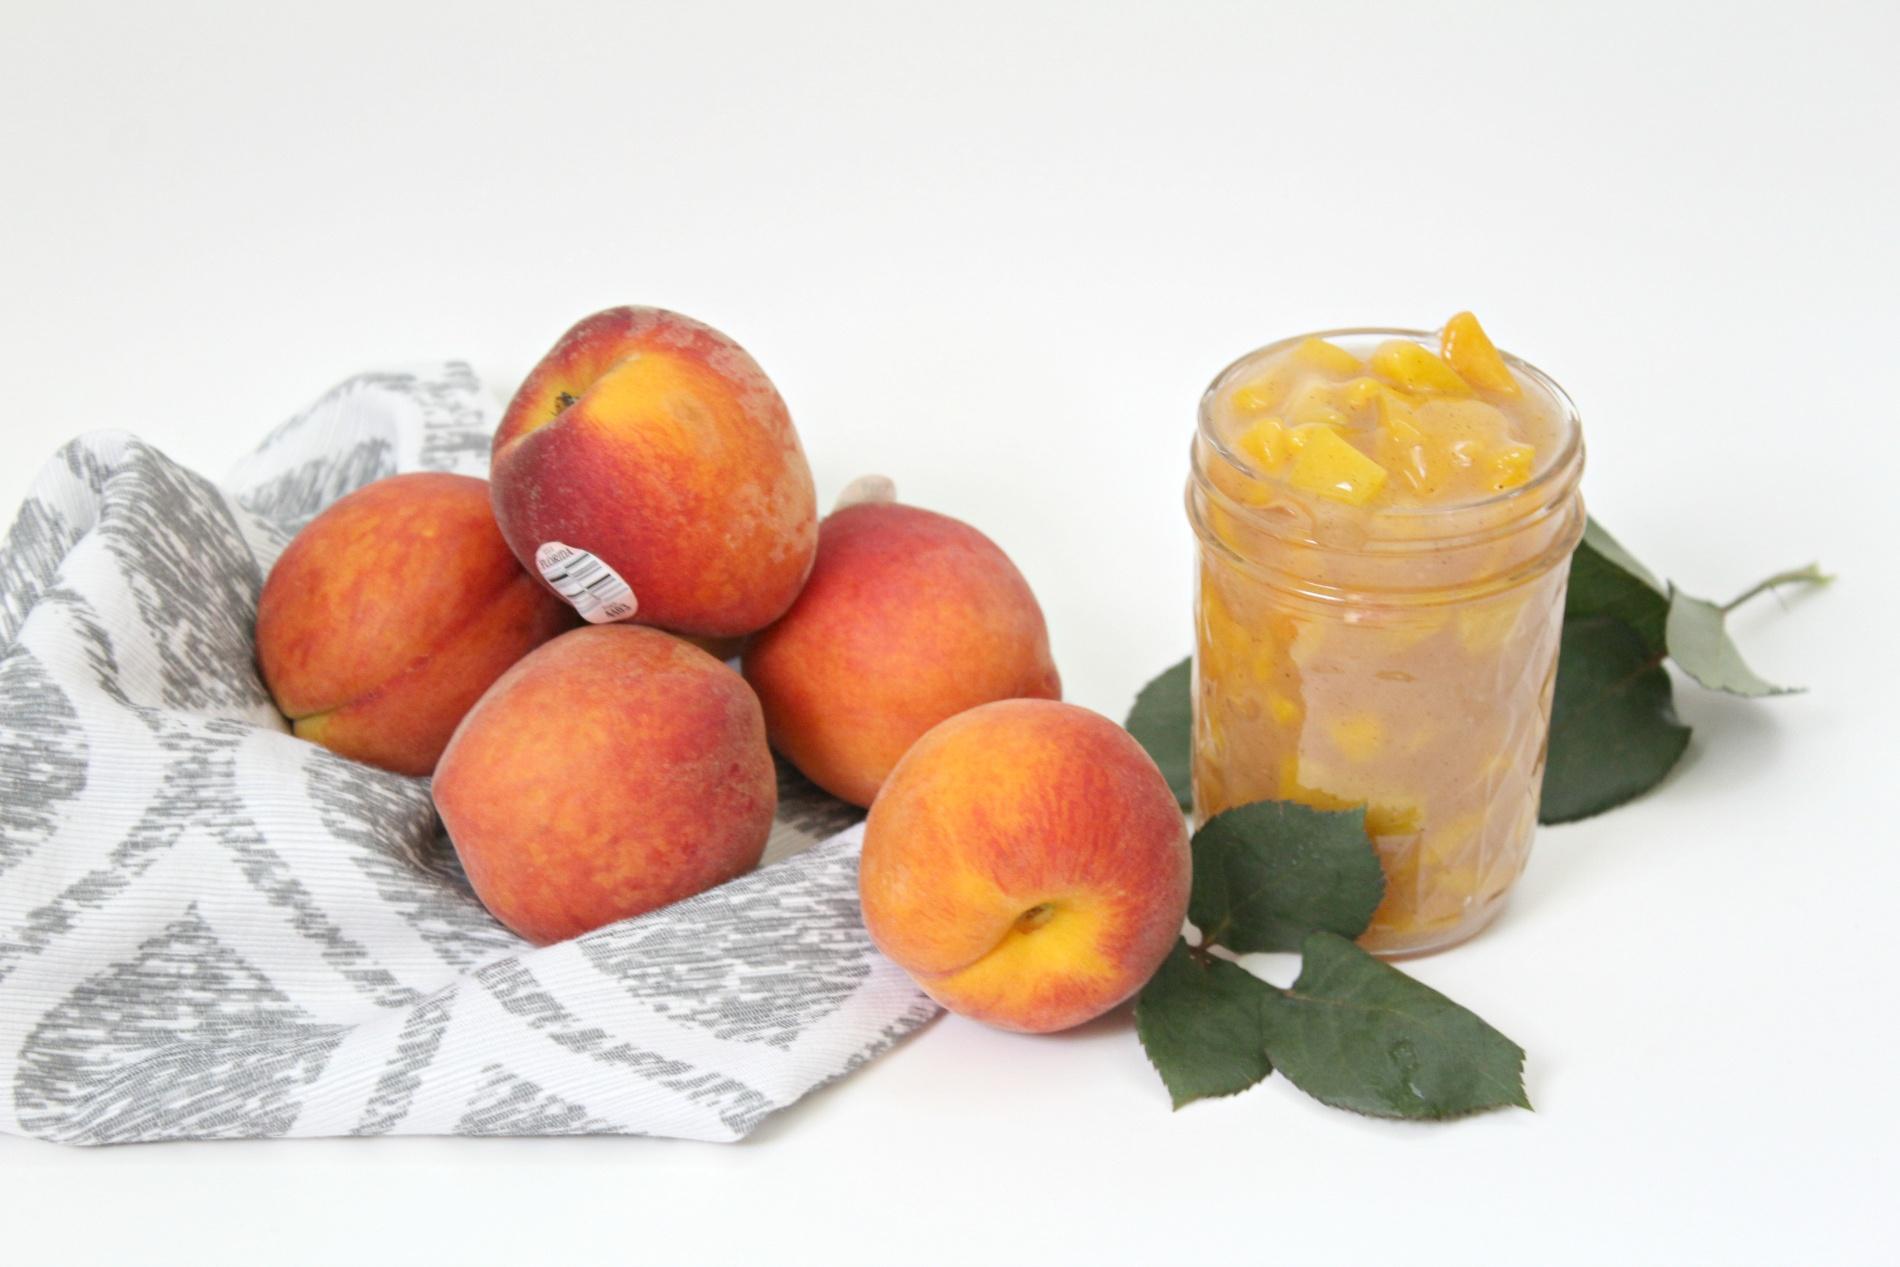 Tasty Peach Pie Filling